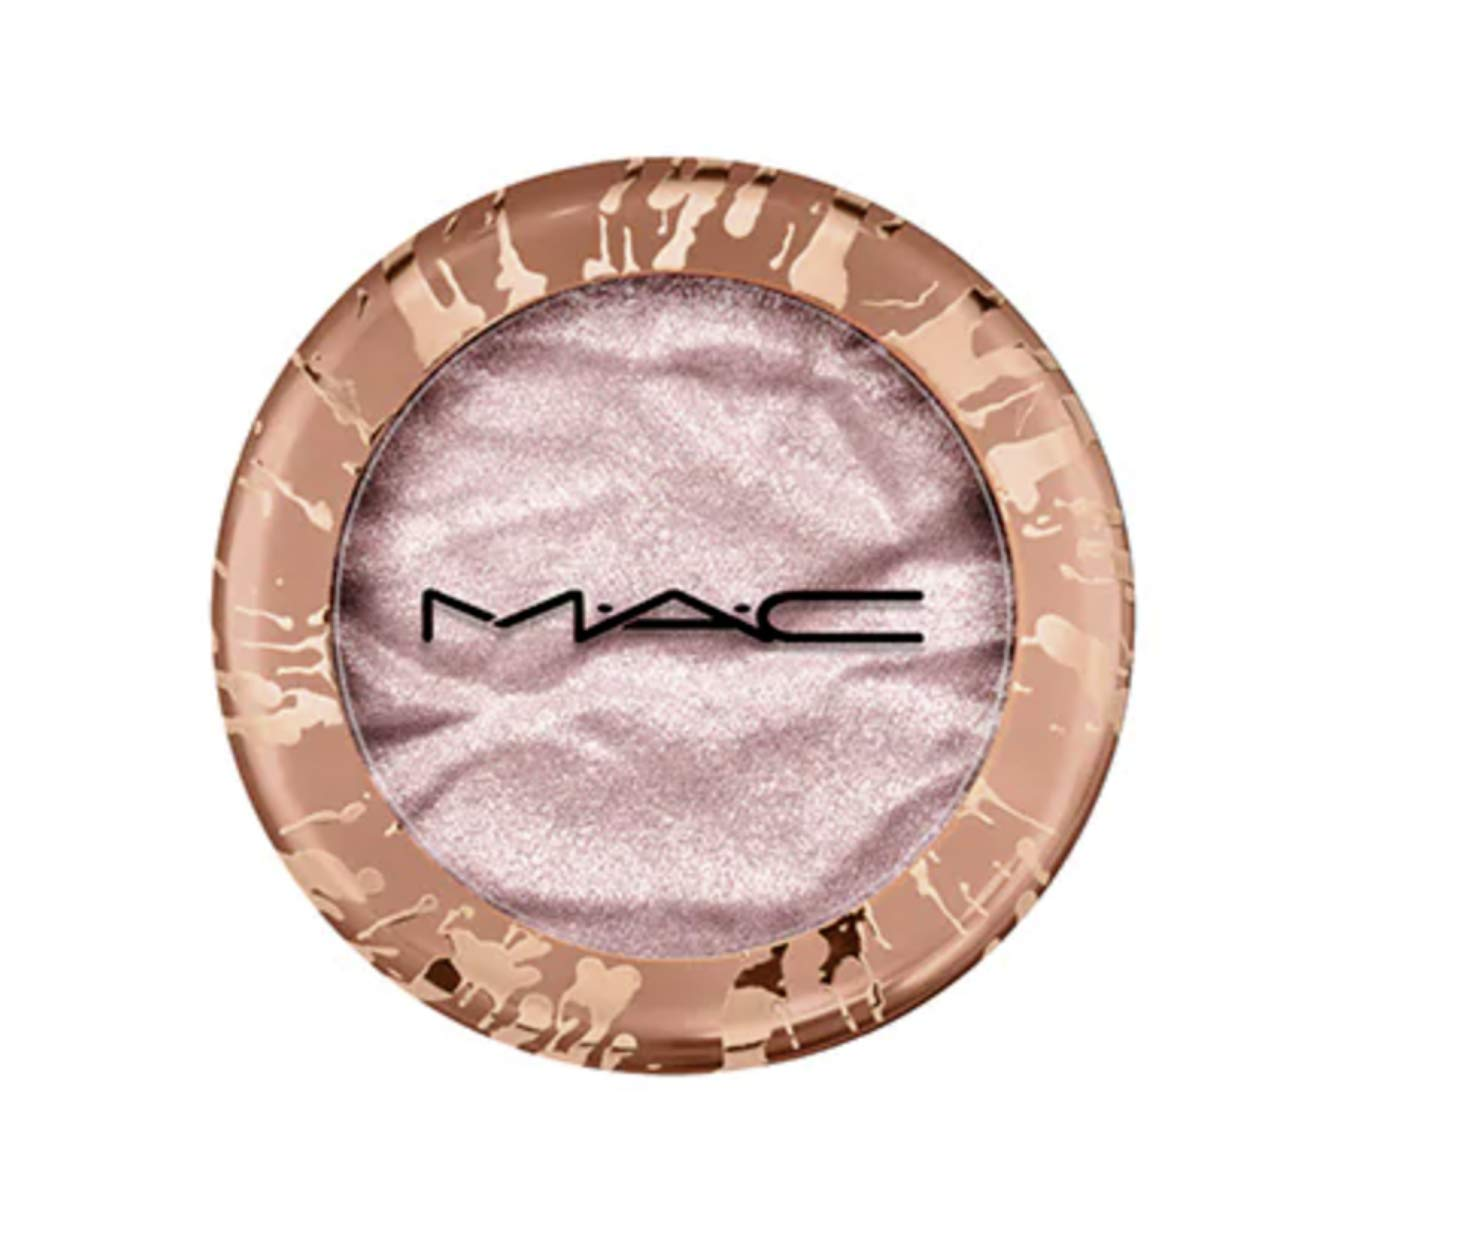 MAC SUNPHORIA EYESHADOW! Bronzer Collection Foiled Eyeshadow New in Box Limited Edition